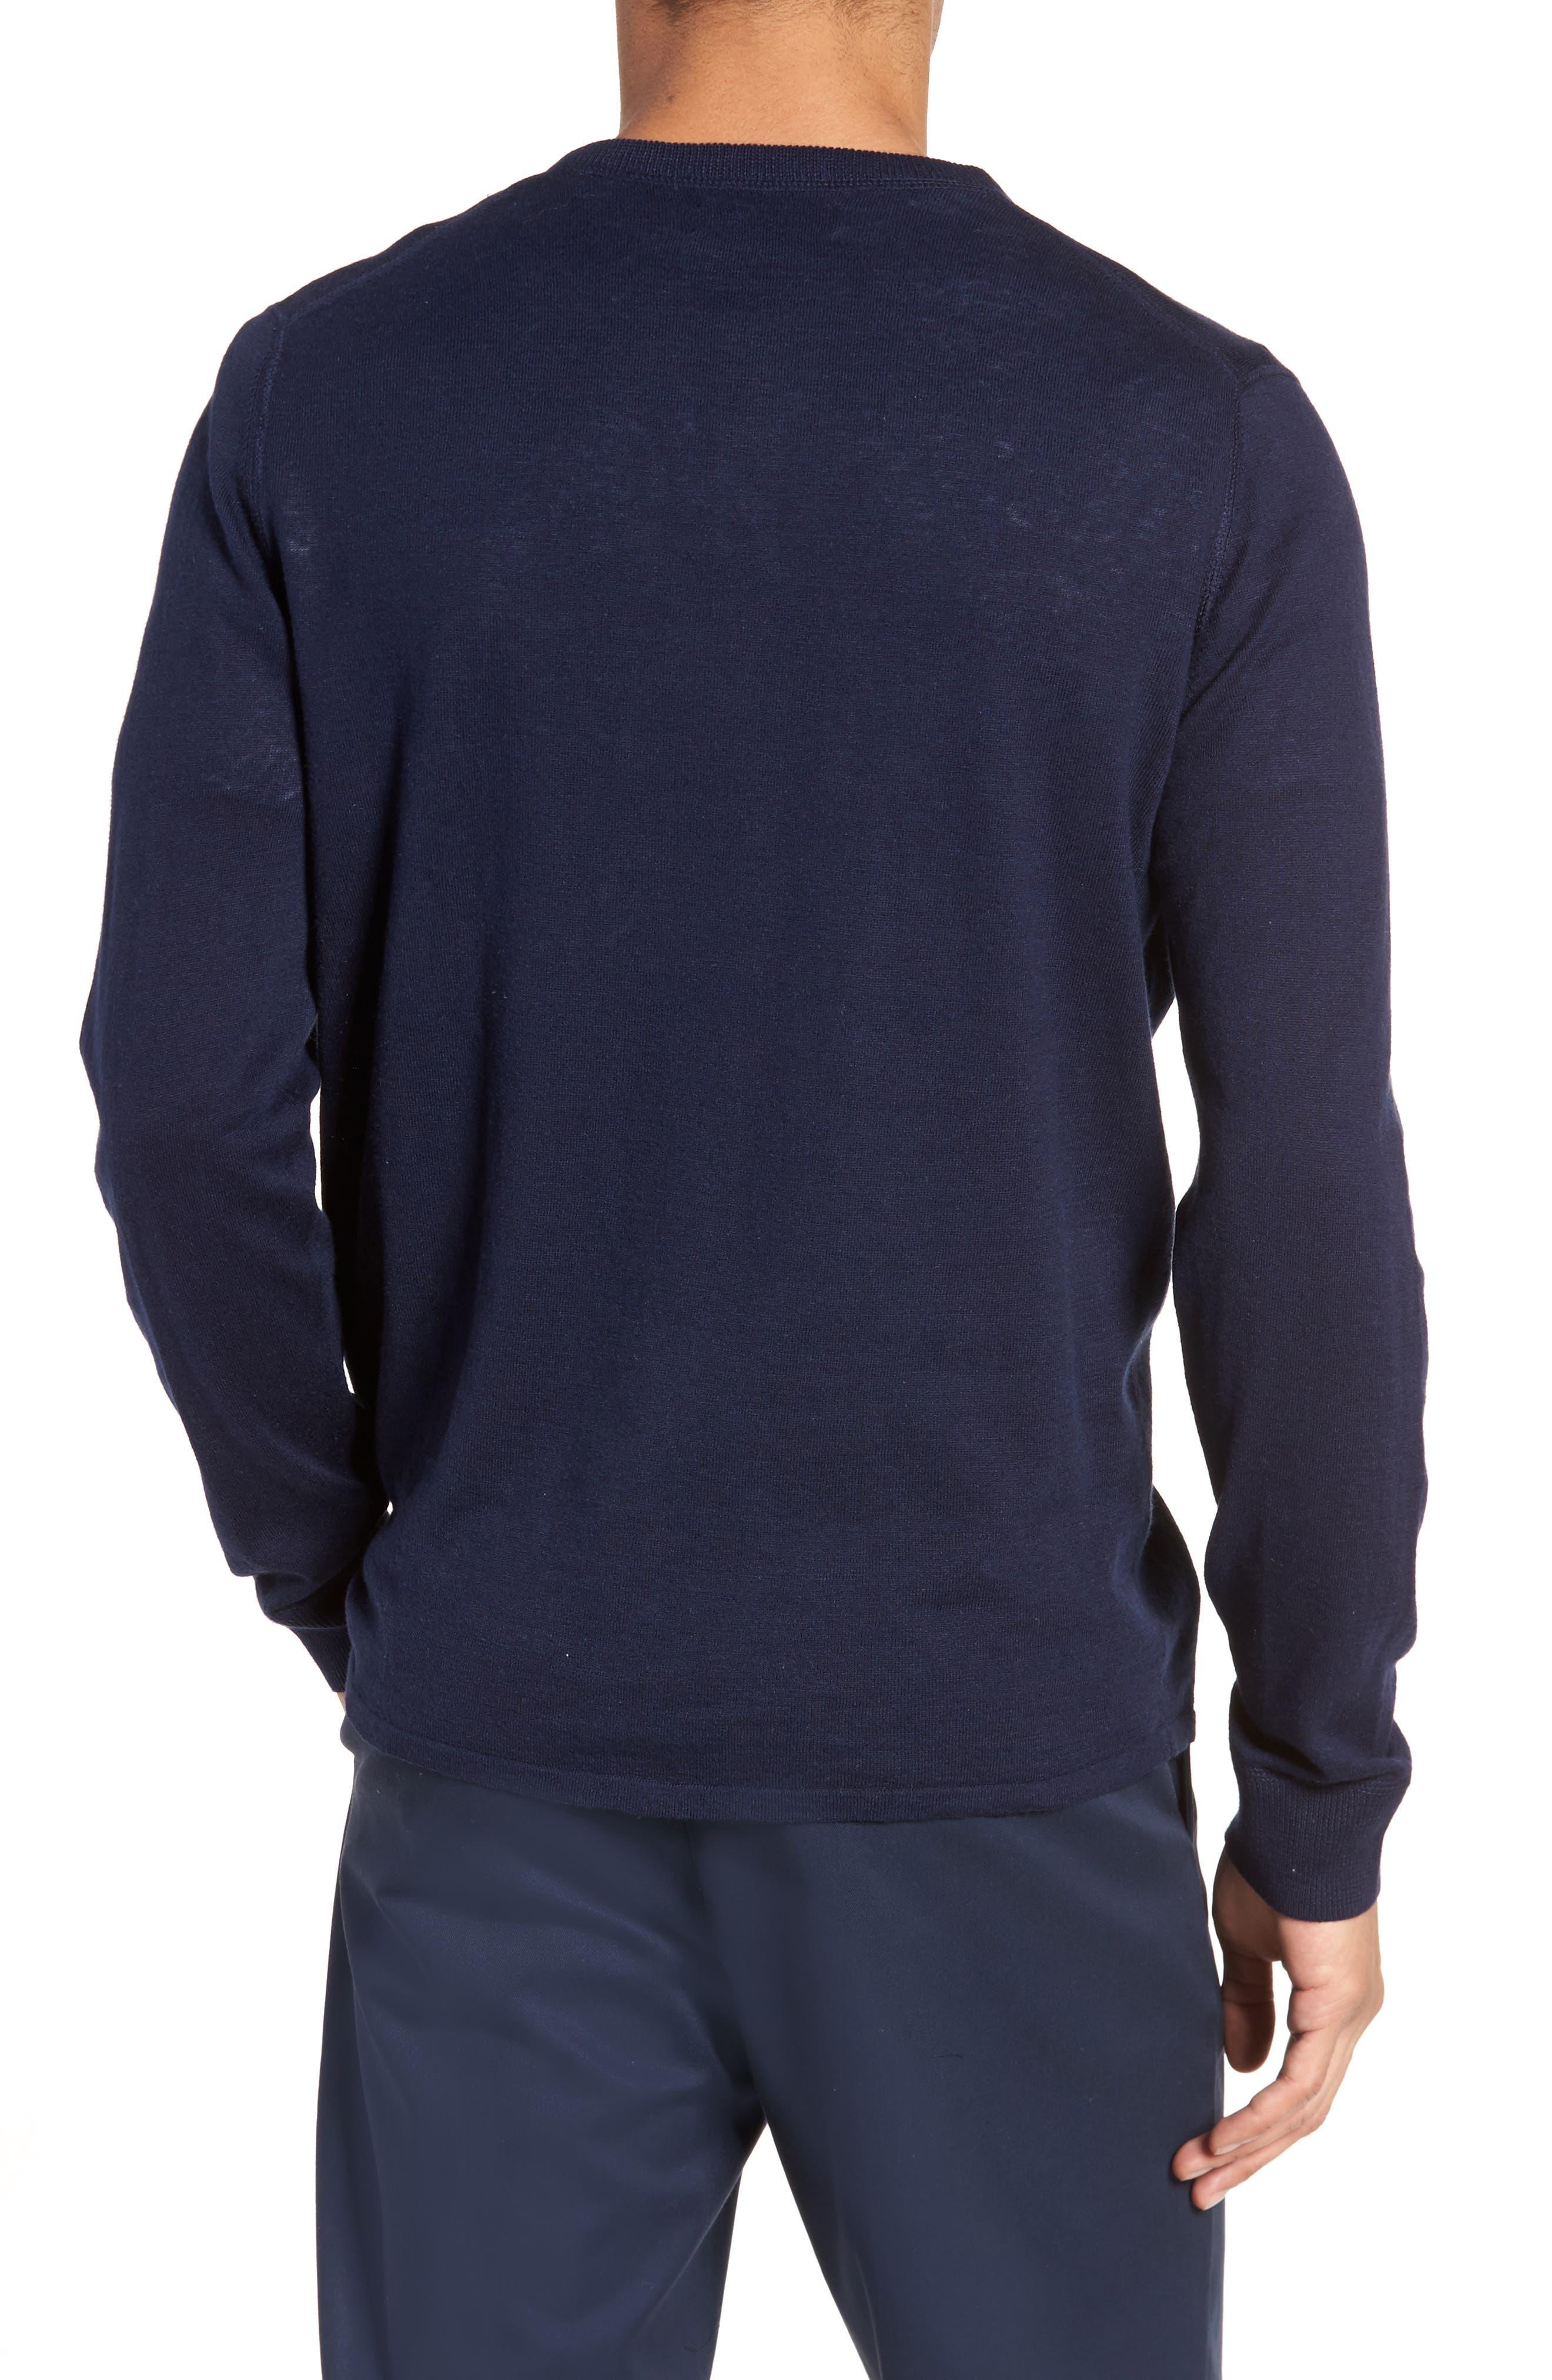 Alternate Image 2  - Nordstrom Men's Shop Long Sleeve Cotton & Linen Blend Henley